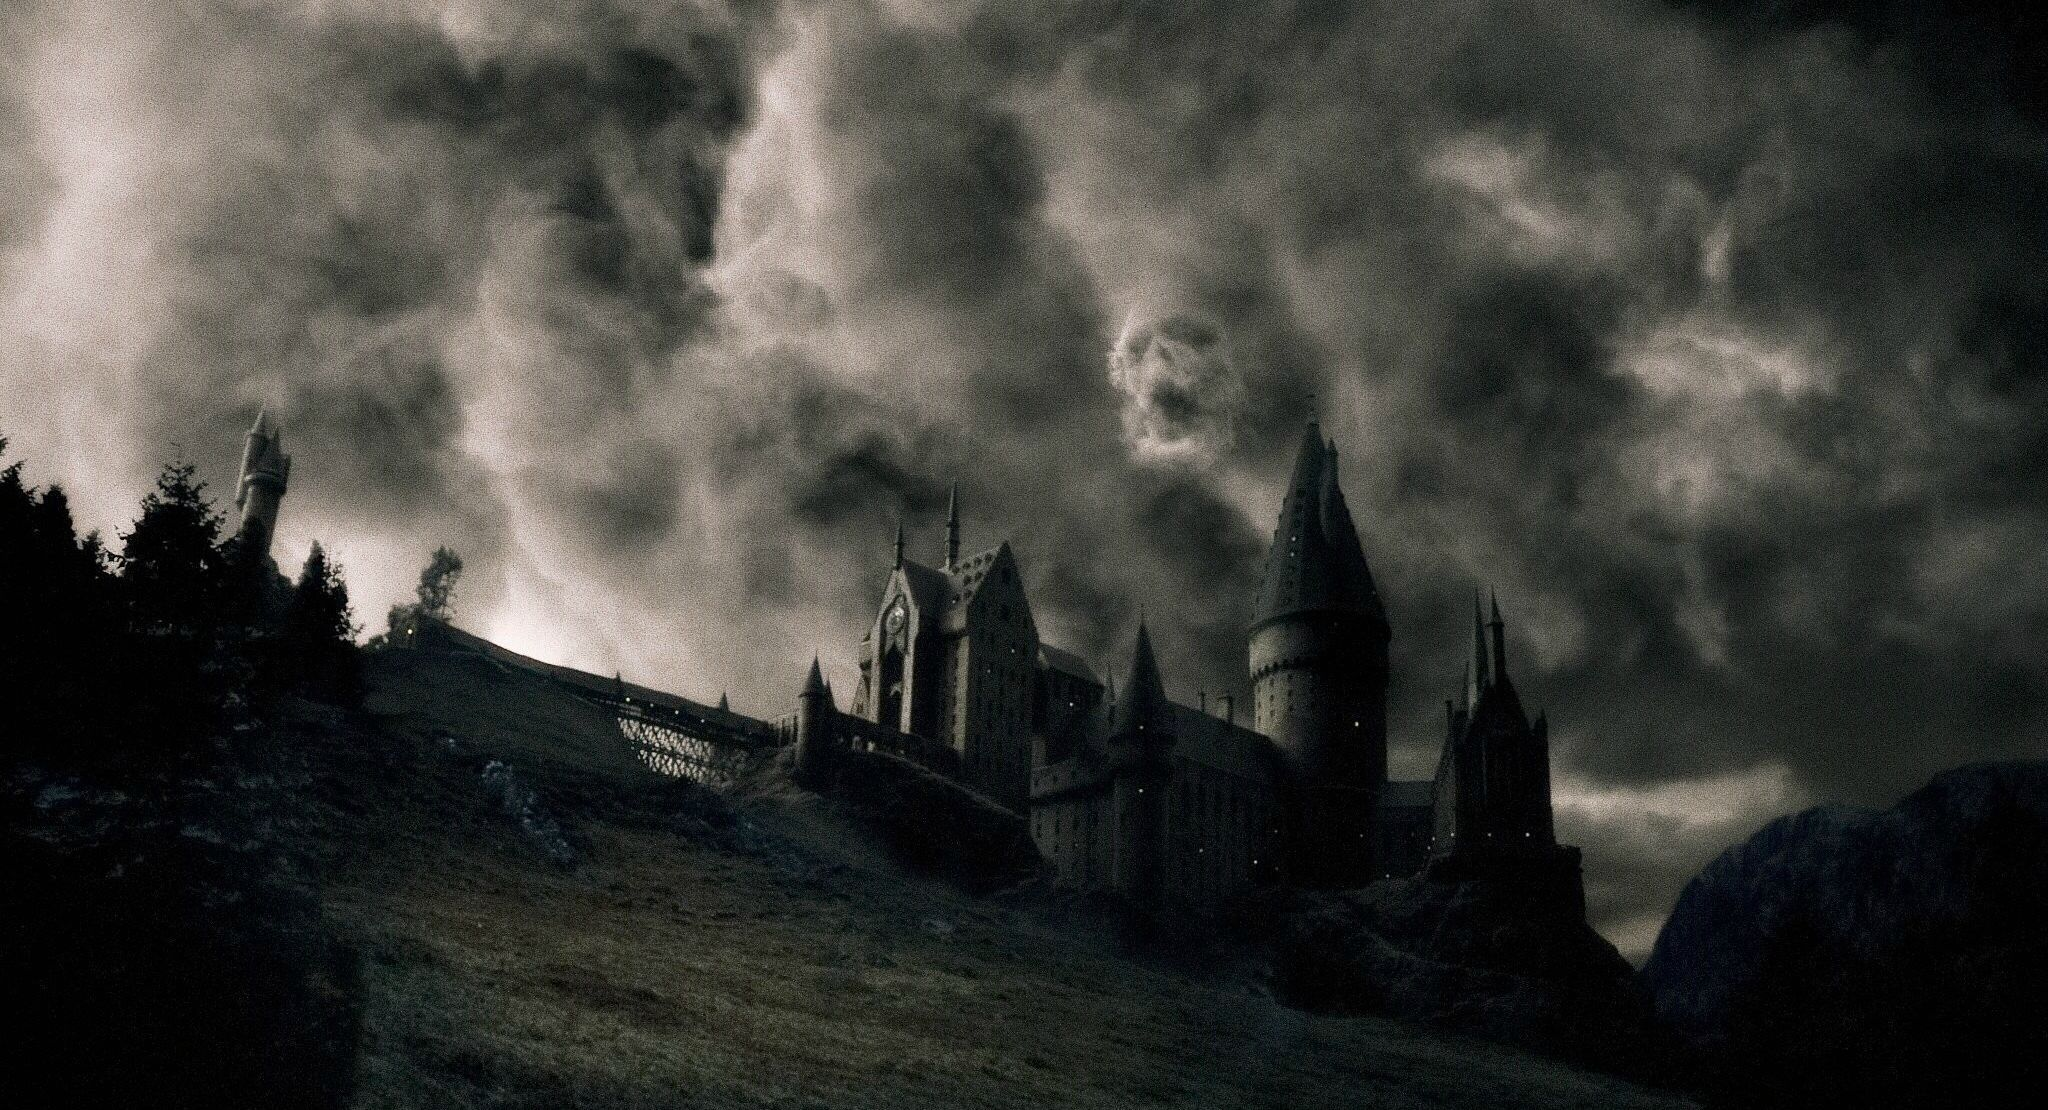 Harry Potter Hogwarts Wallpaper Desktop Background For Free Wallpaper Harry Potter Wallpaper Harry Potter Pictures Harry Potter Aesthetic